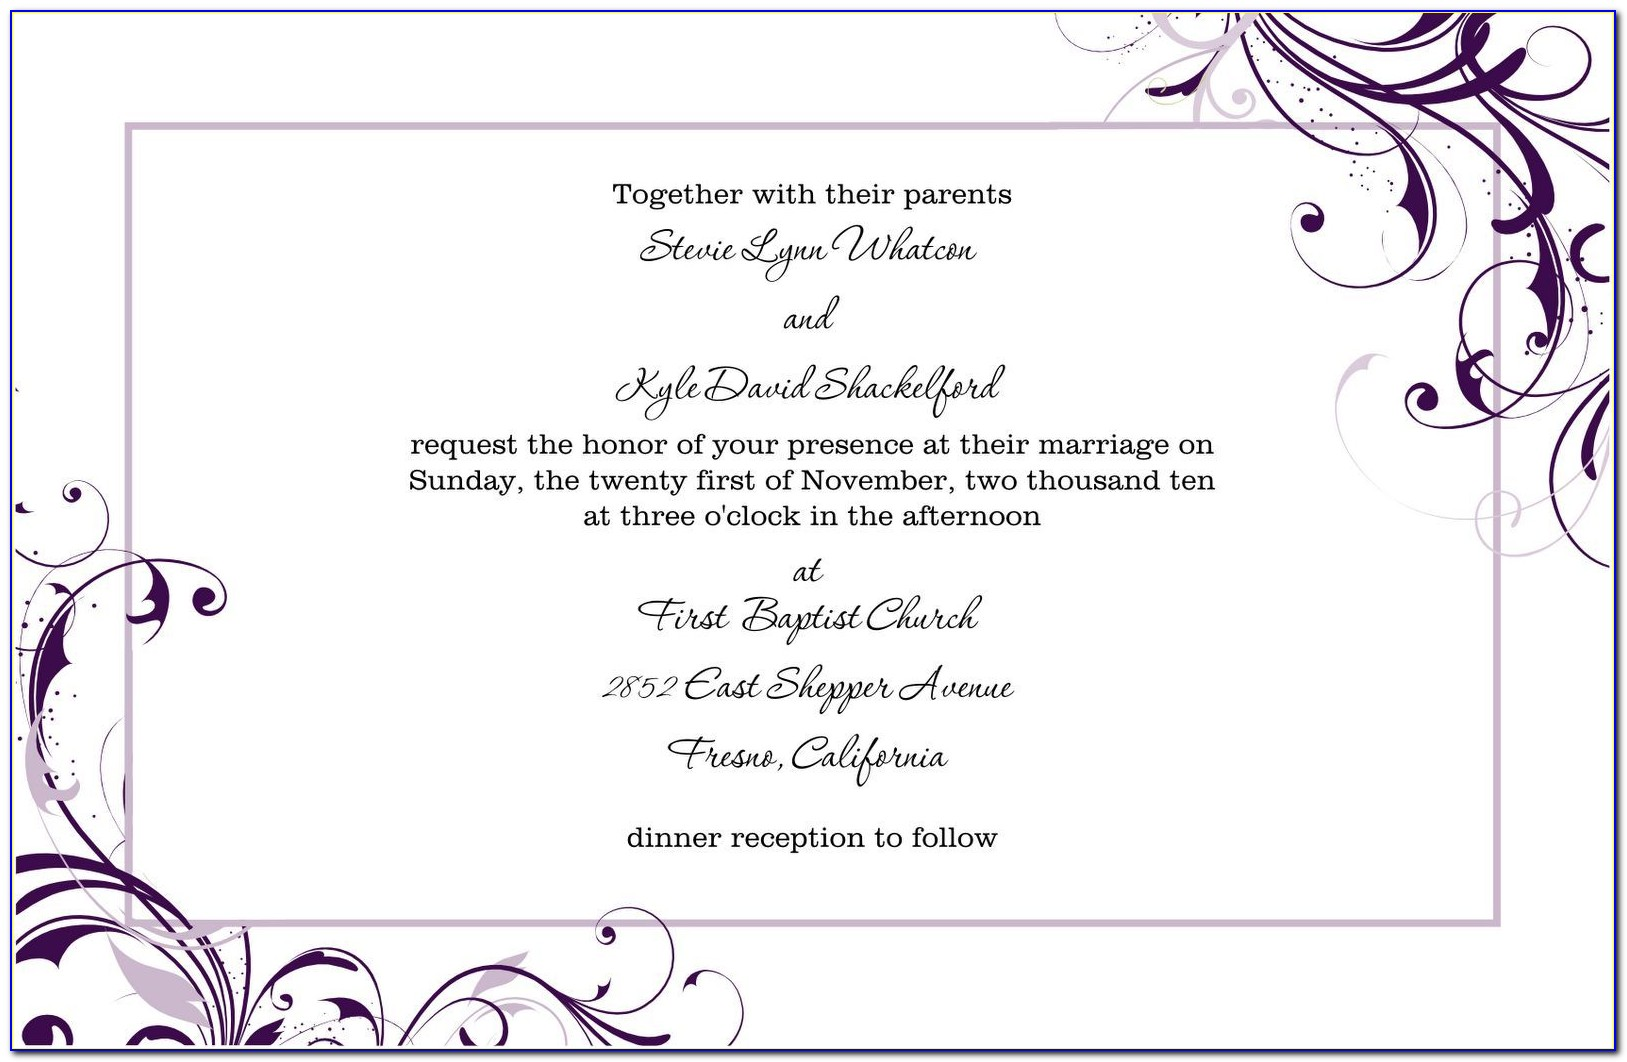 Formal Invitation Template Microsoft Word